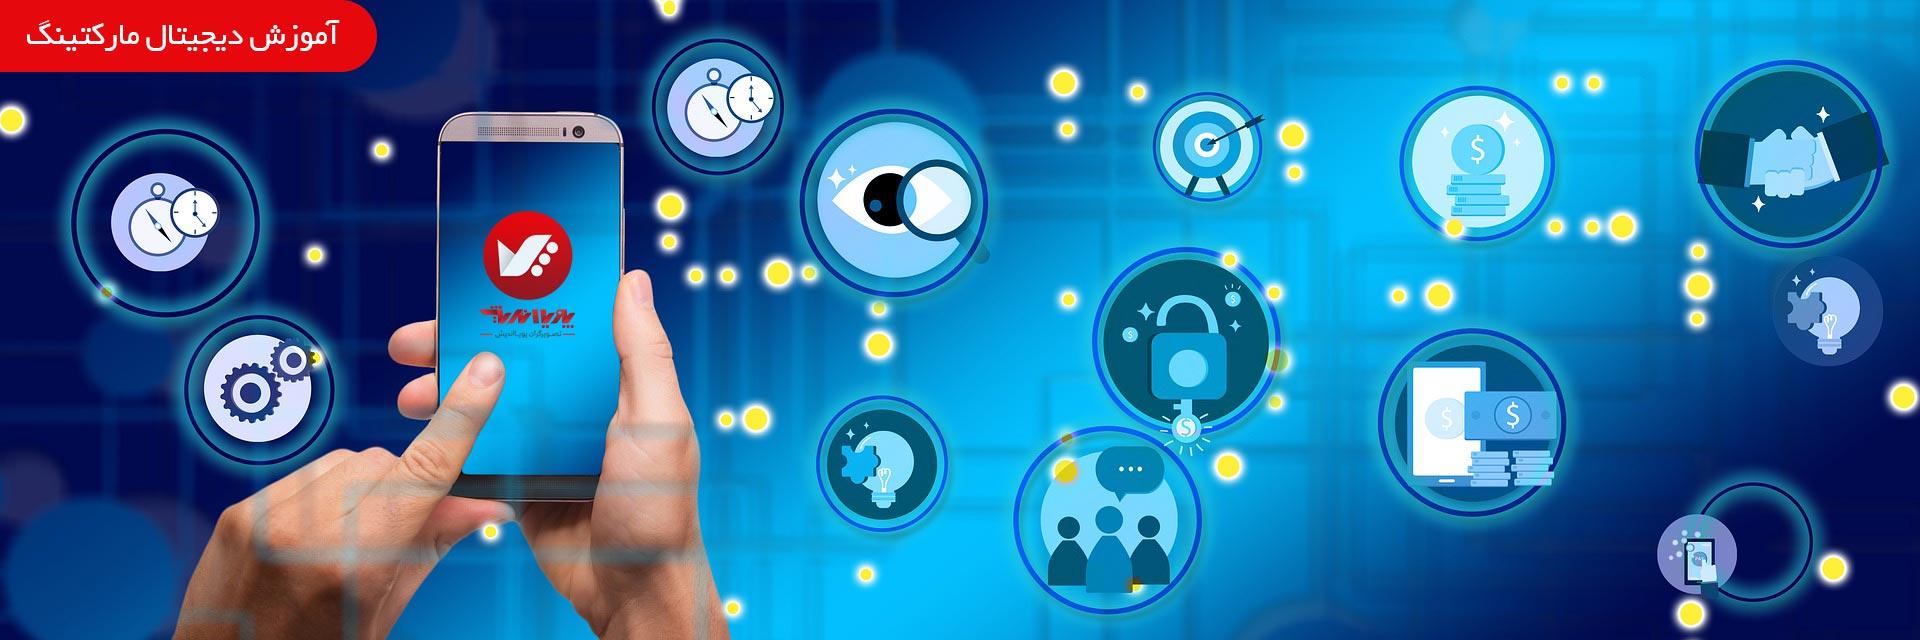 digital marketing banner - آموزش دیجیتال مارکتینگ | کلاس دیجیتال مارکتینگ